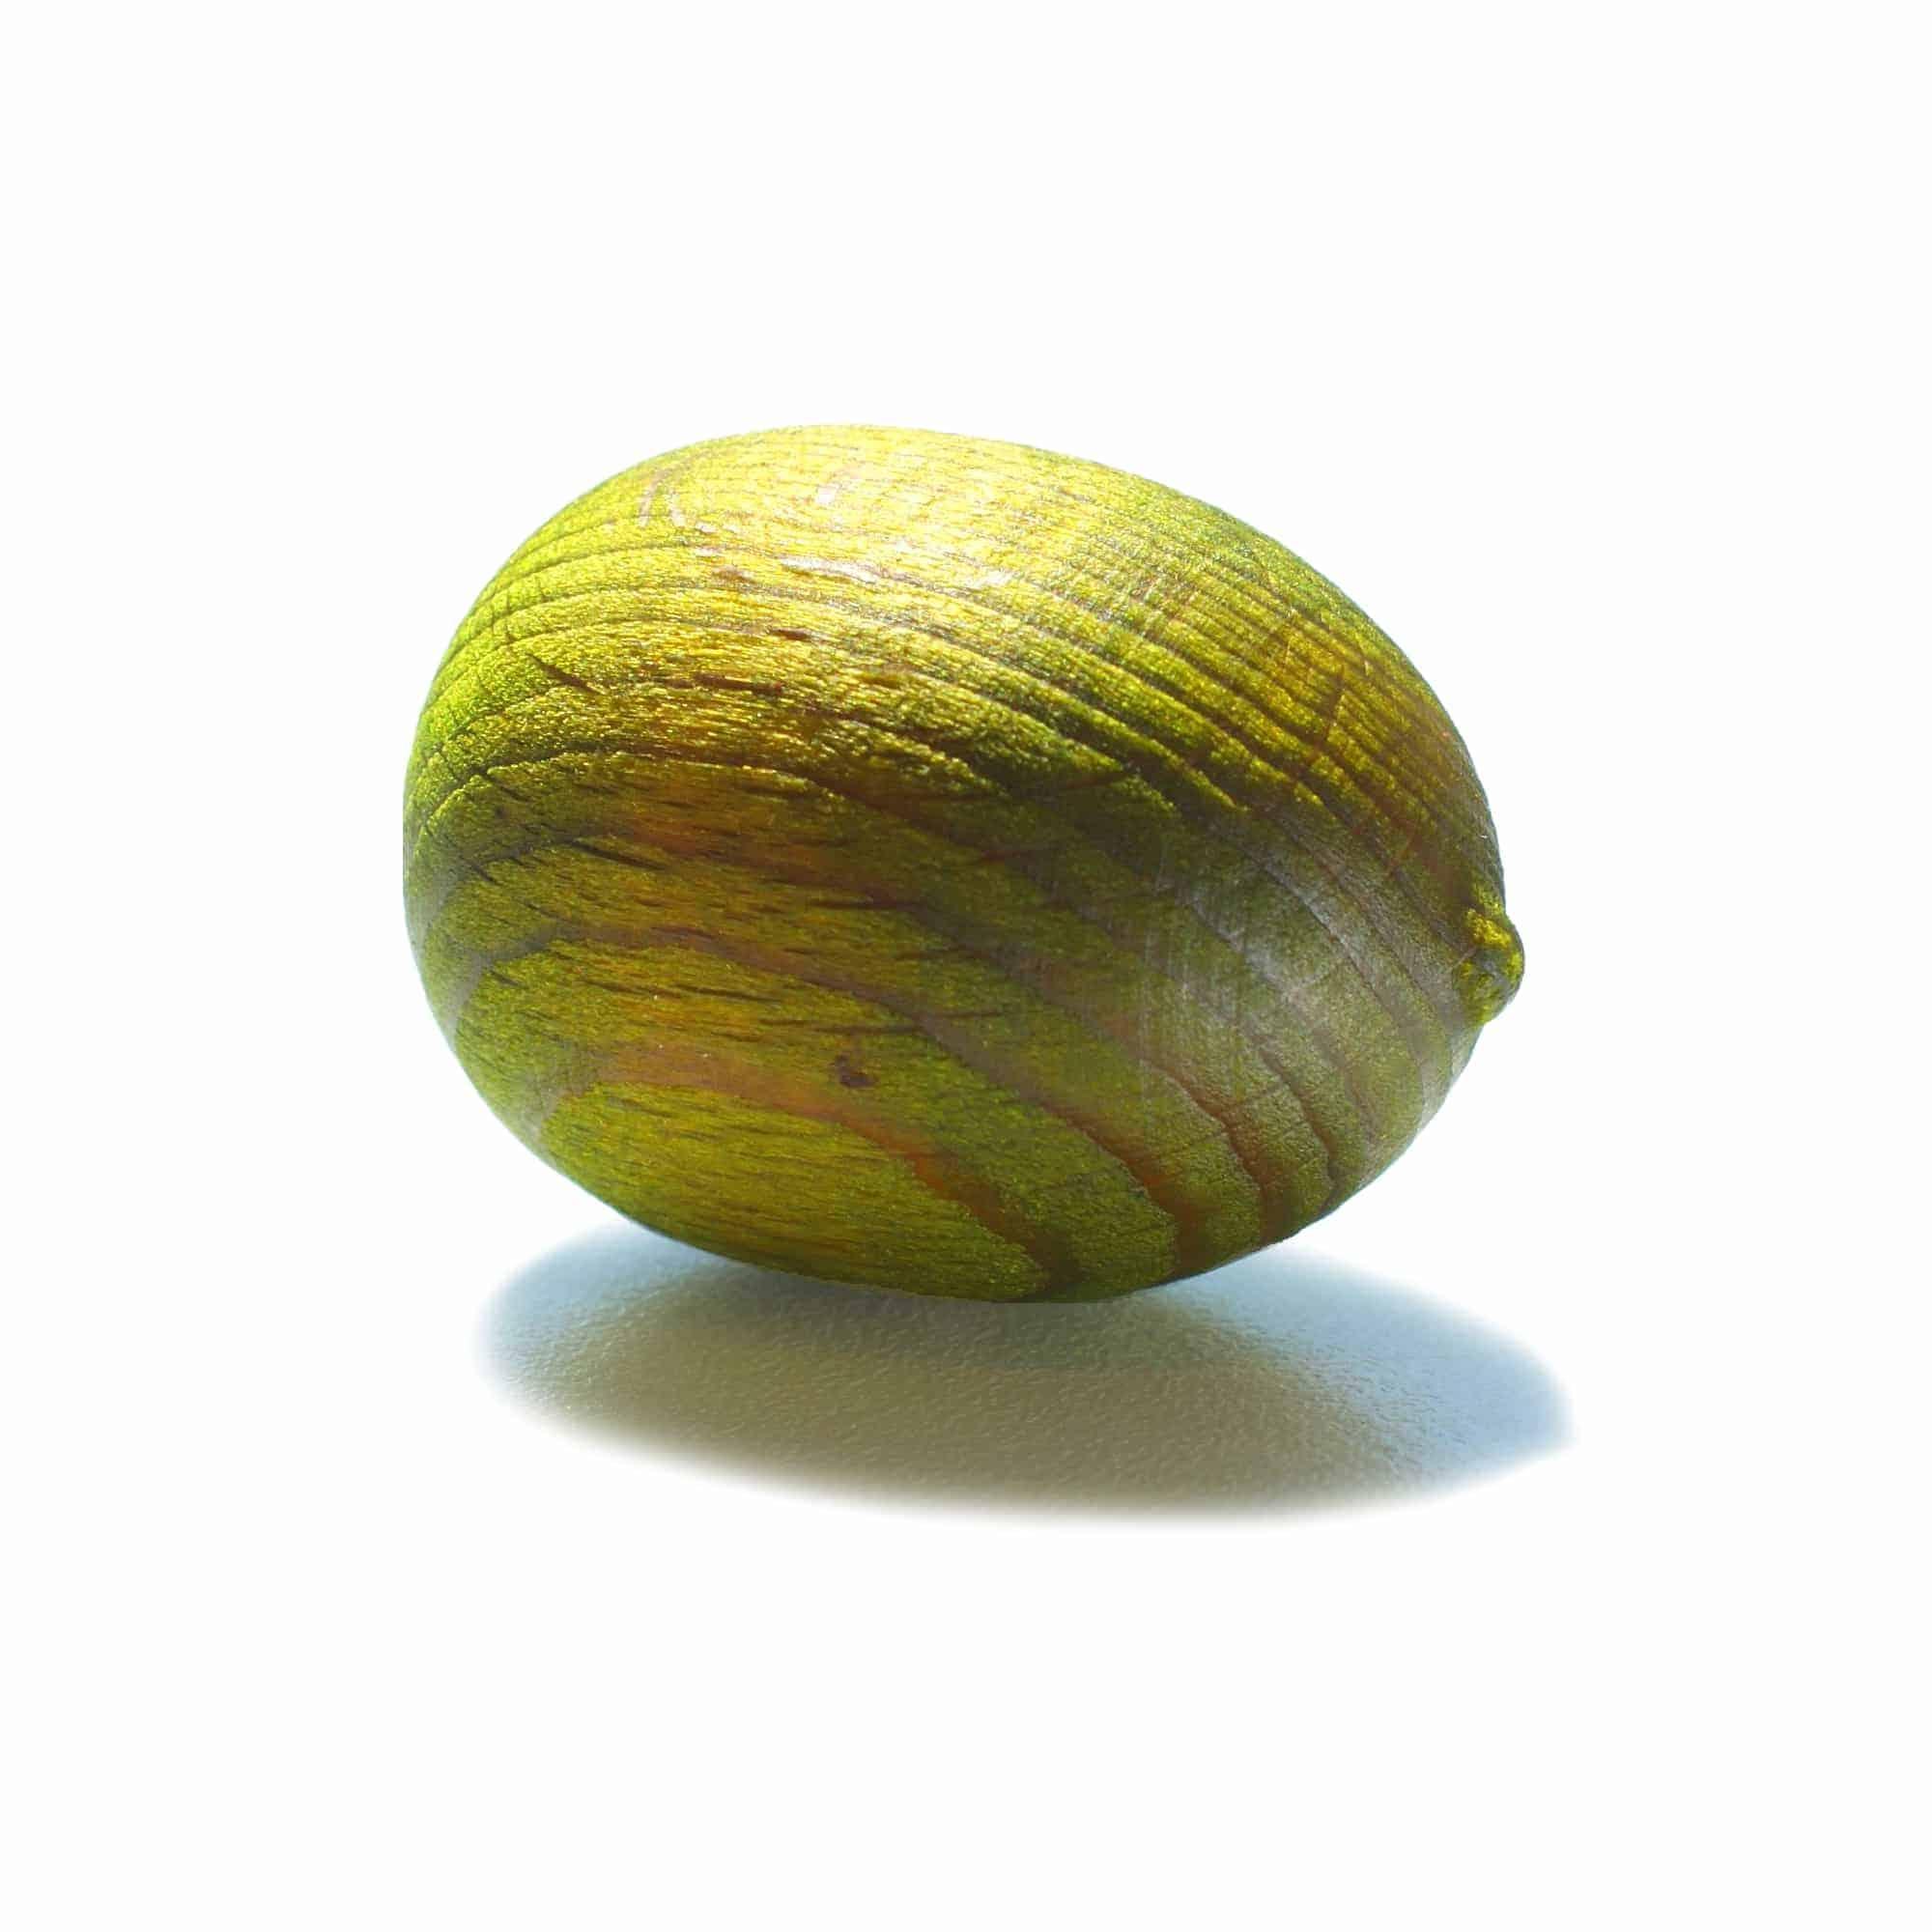 Duftfrucht Kiwi